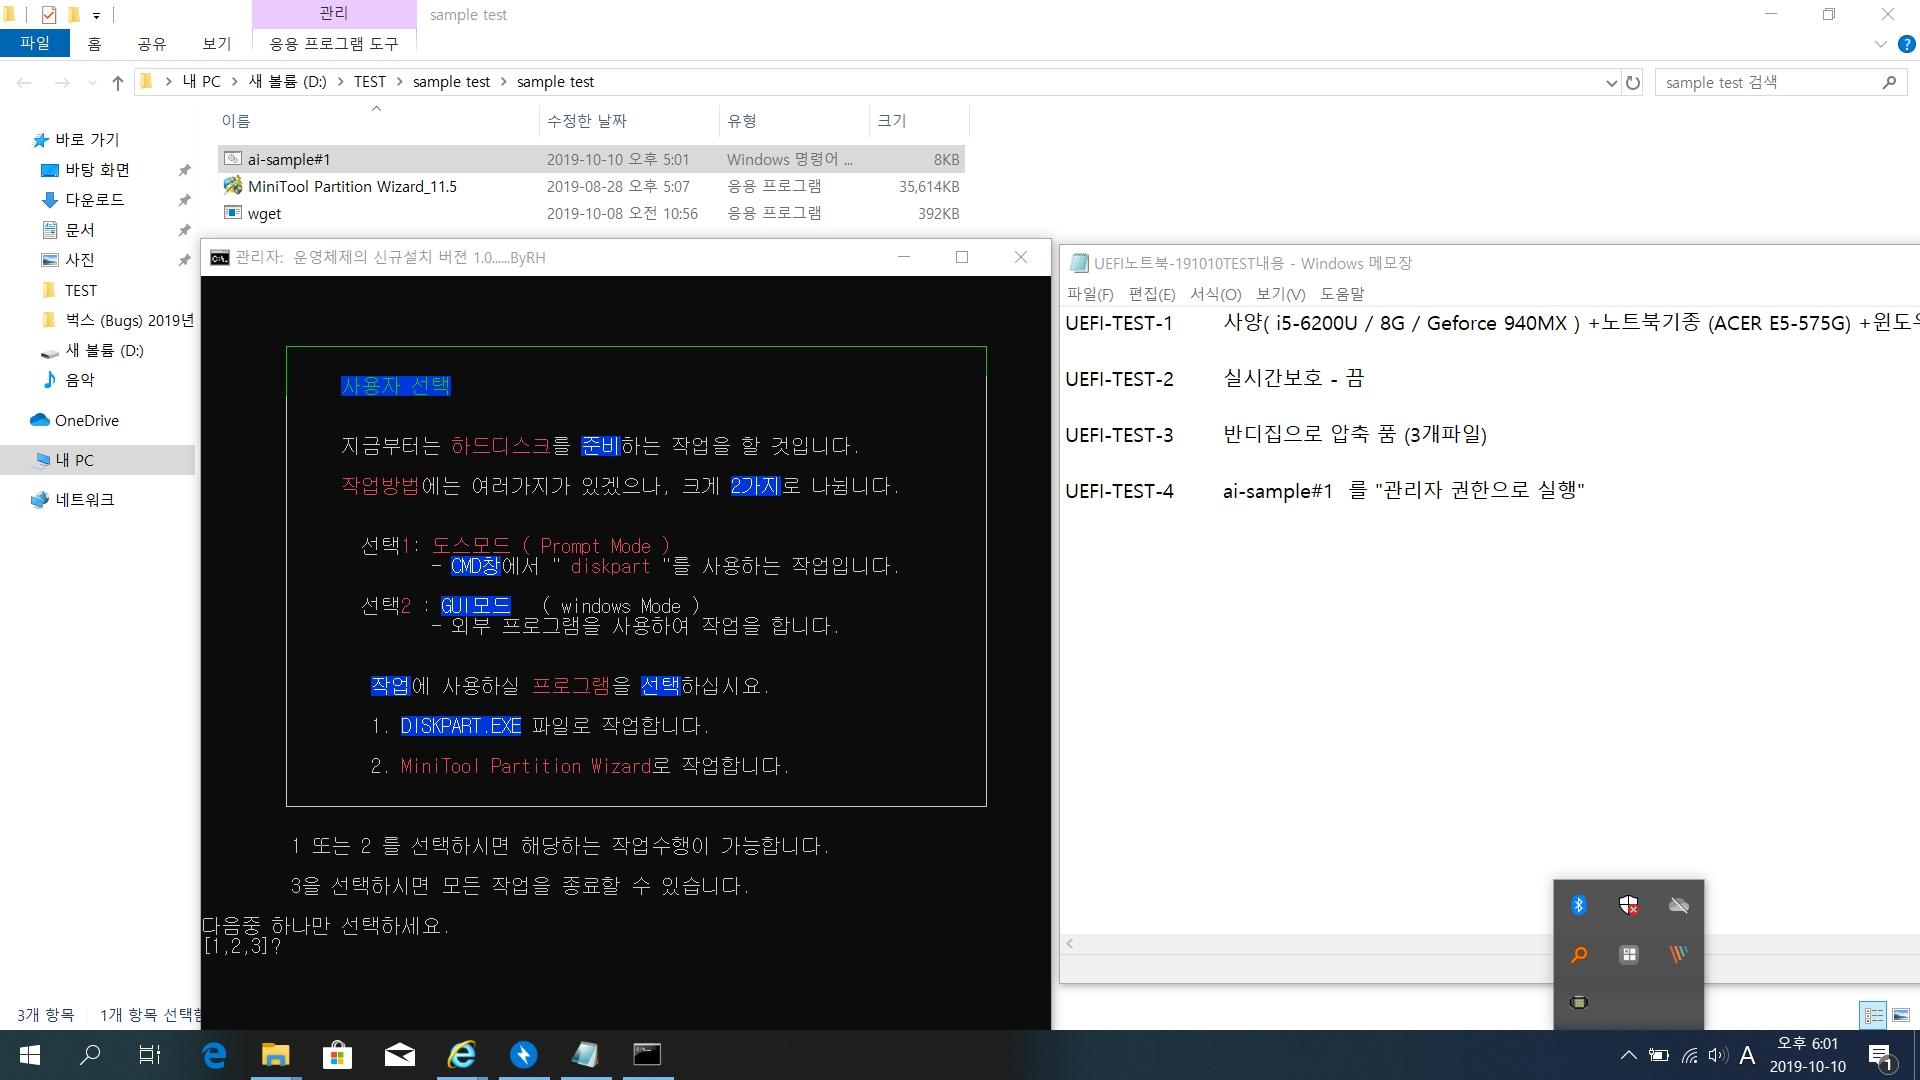 UEFI-TEST-4.jpg